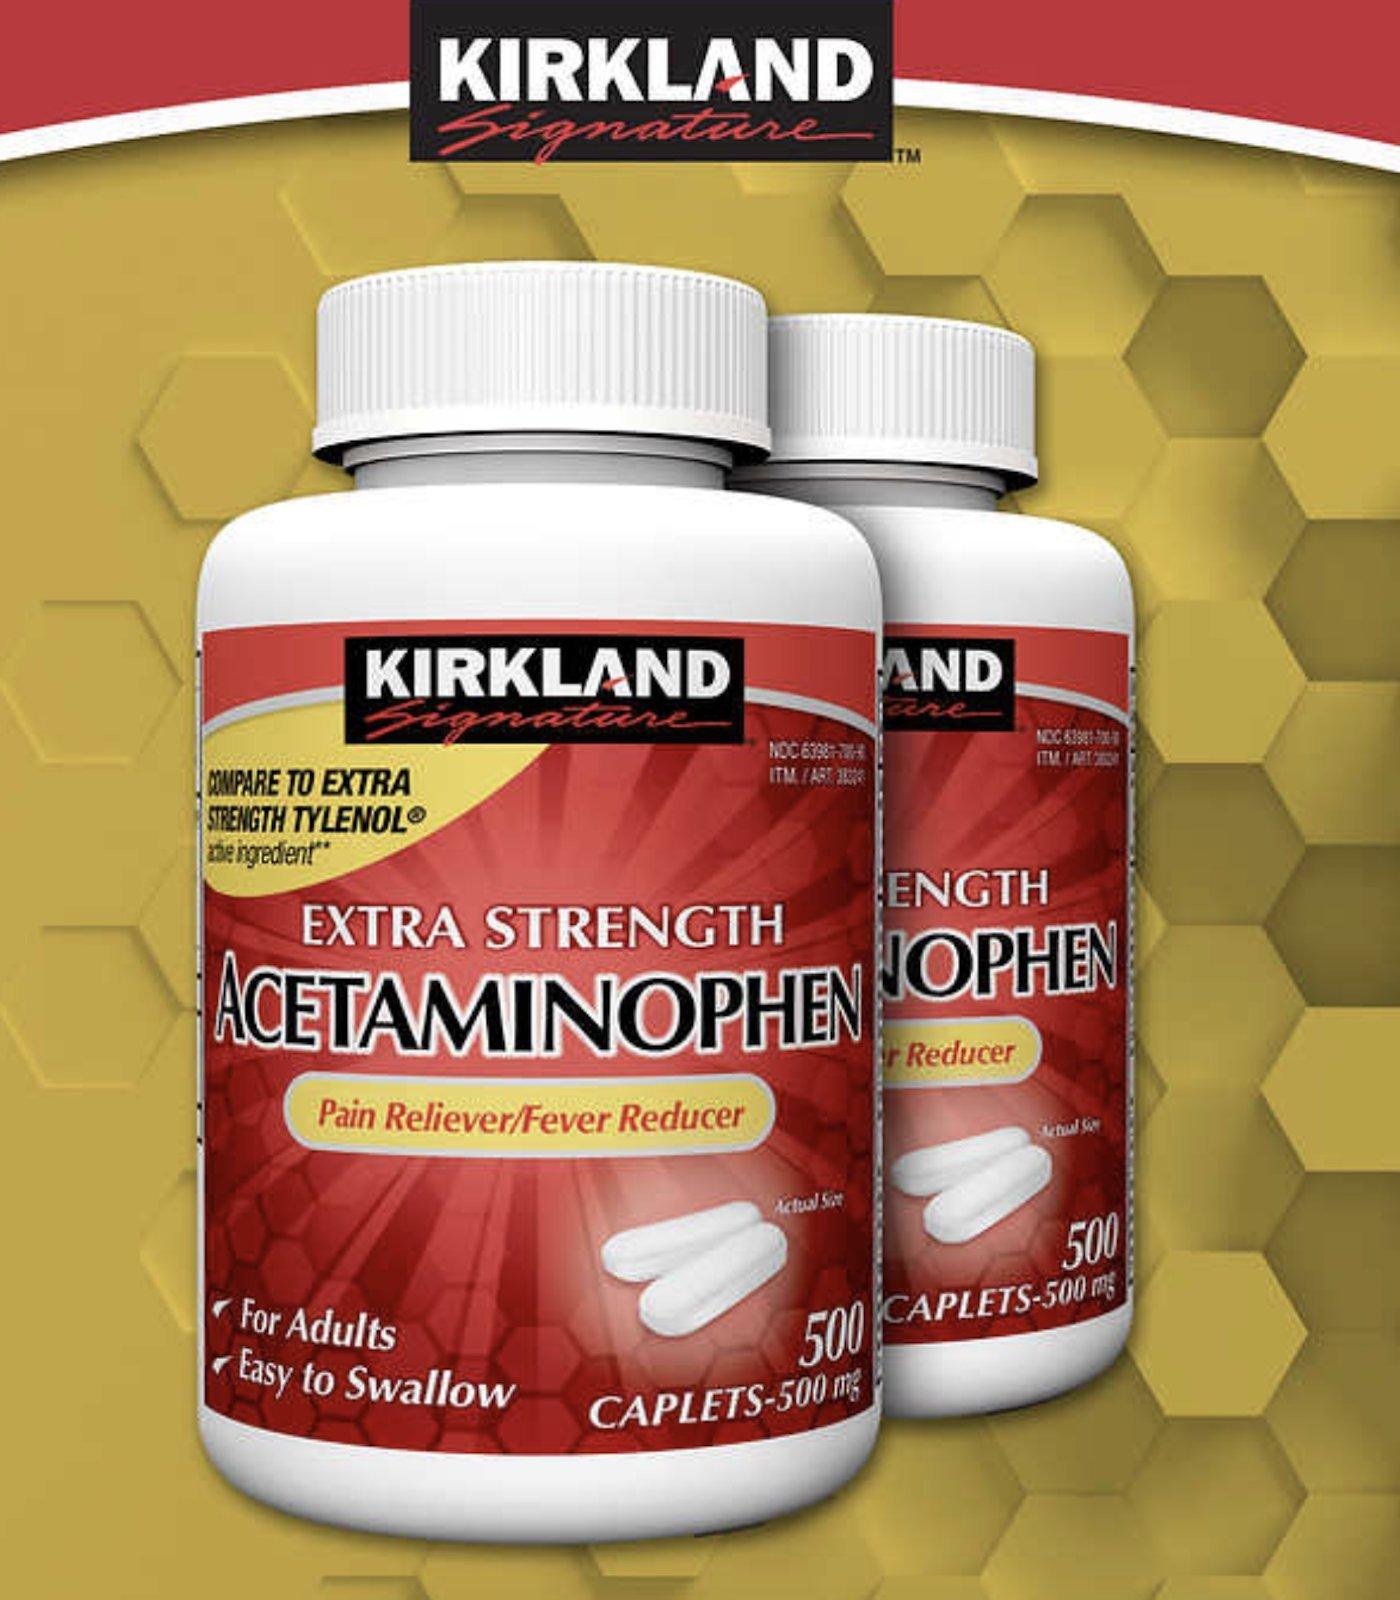 Kirkland Signature Extra Strength Acetaminophen 500MG Caplets 500-Count Bottle, 2 Pack(1000 Total)